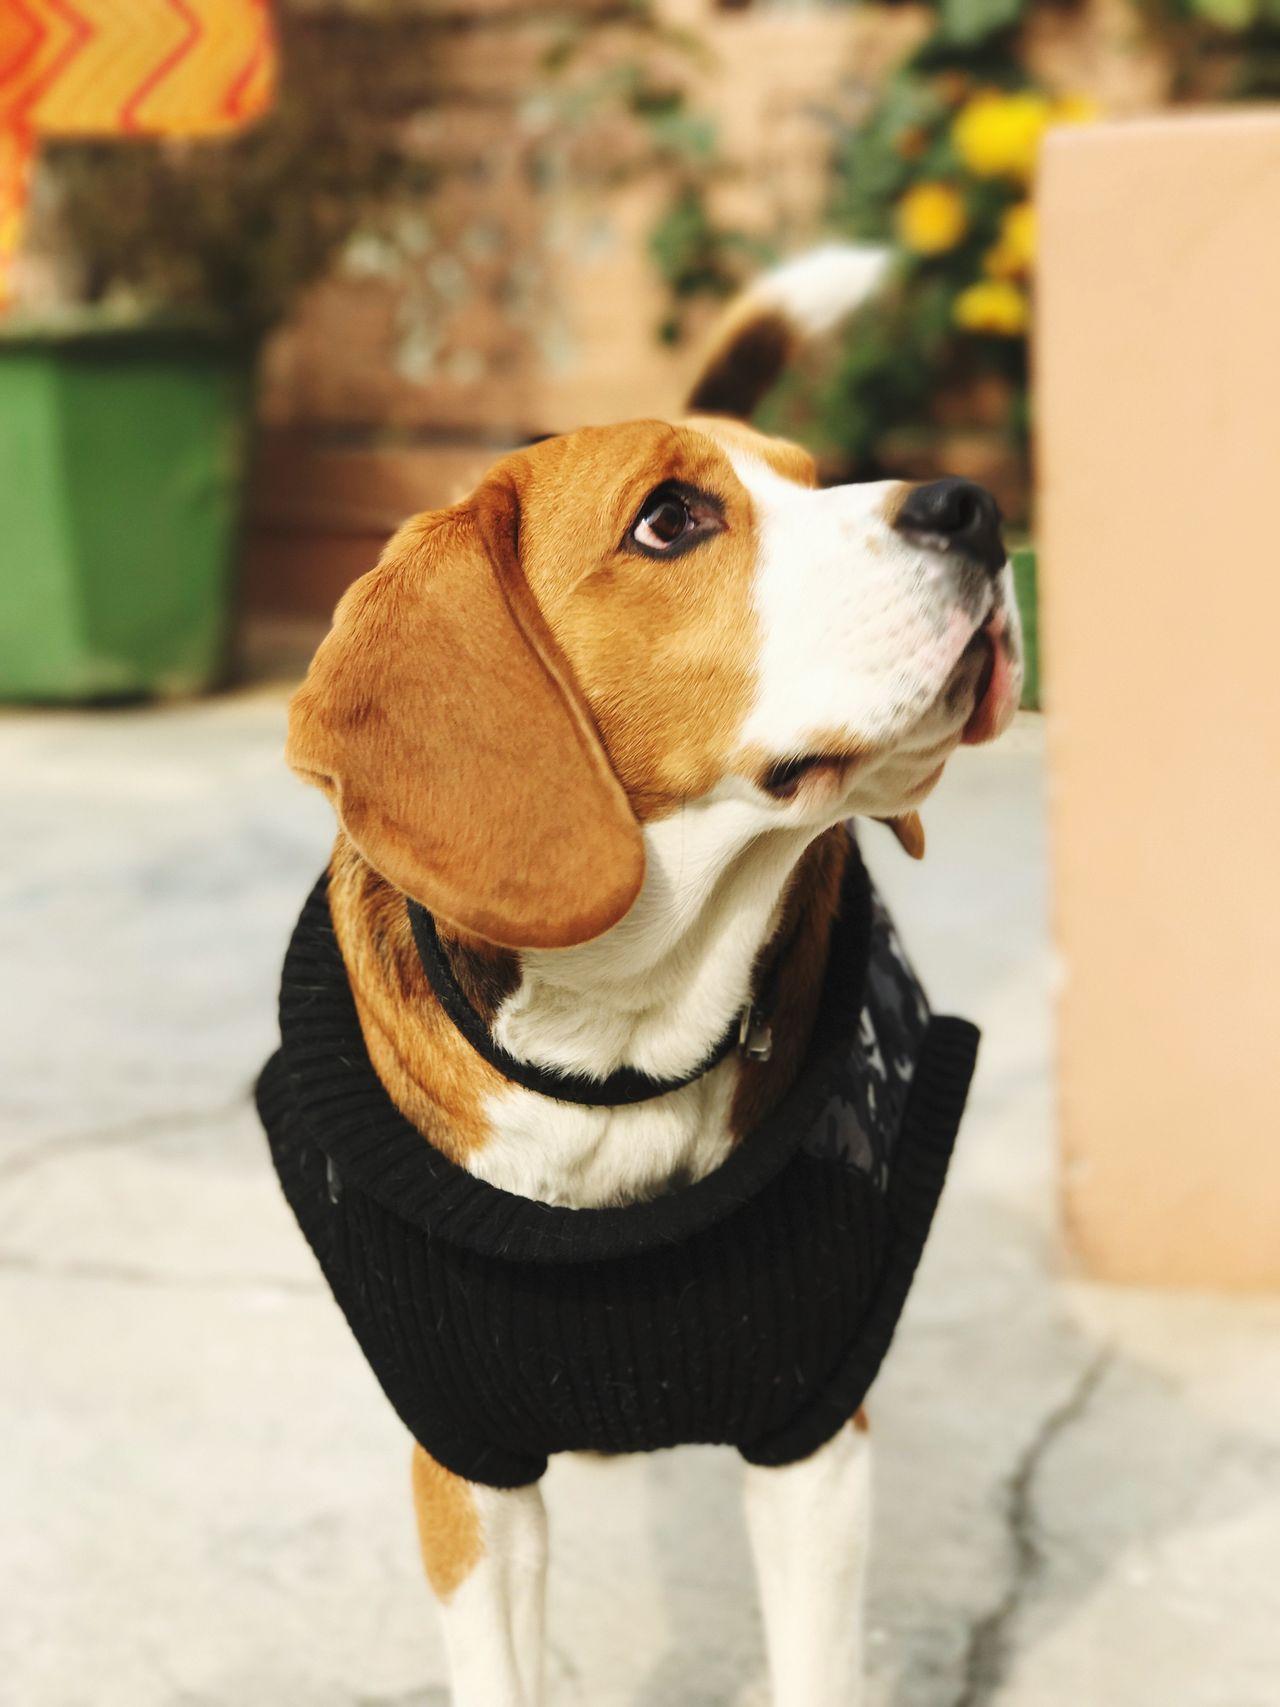 Beagle Dog Blur Potrait Potrait_photography Potraitofadog Puppy EyeEm Selects Pet Portraits